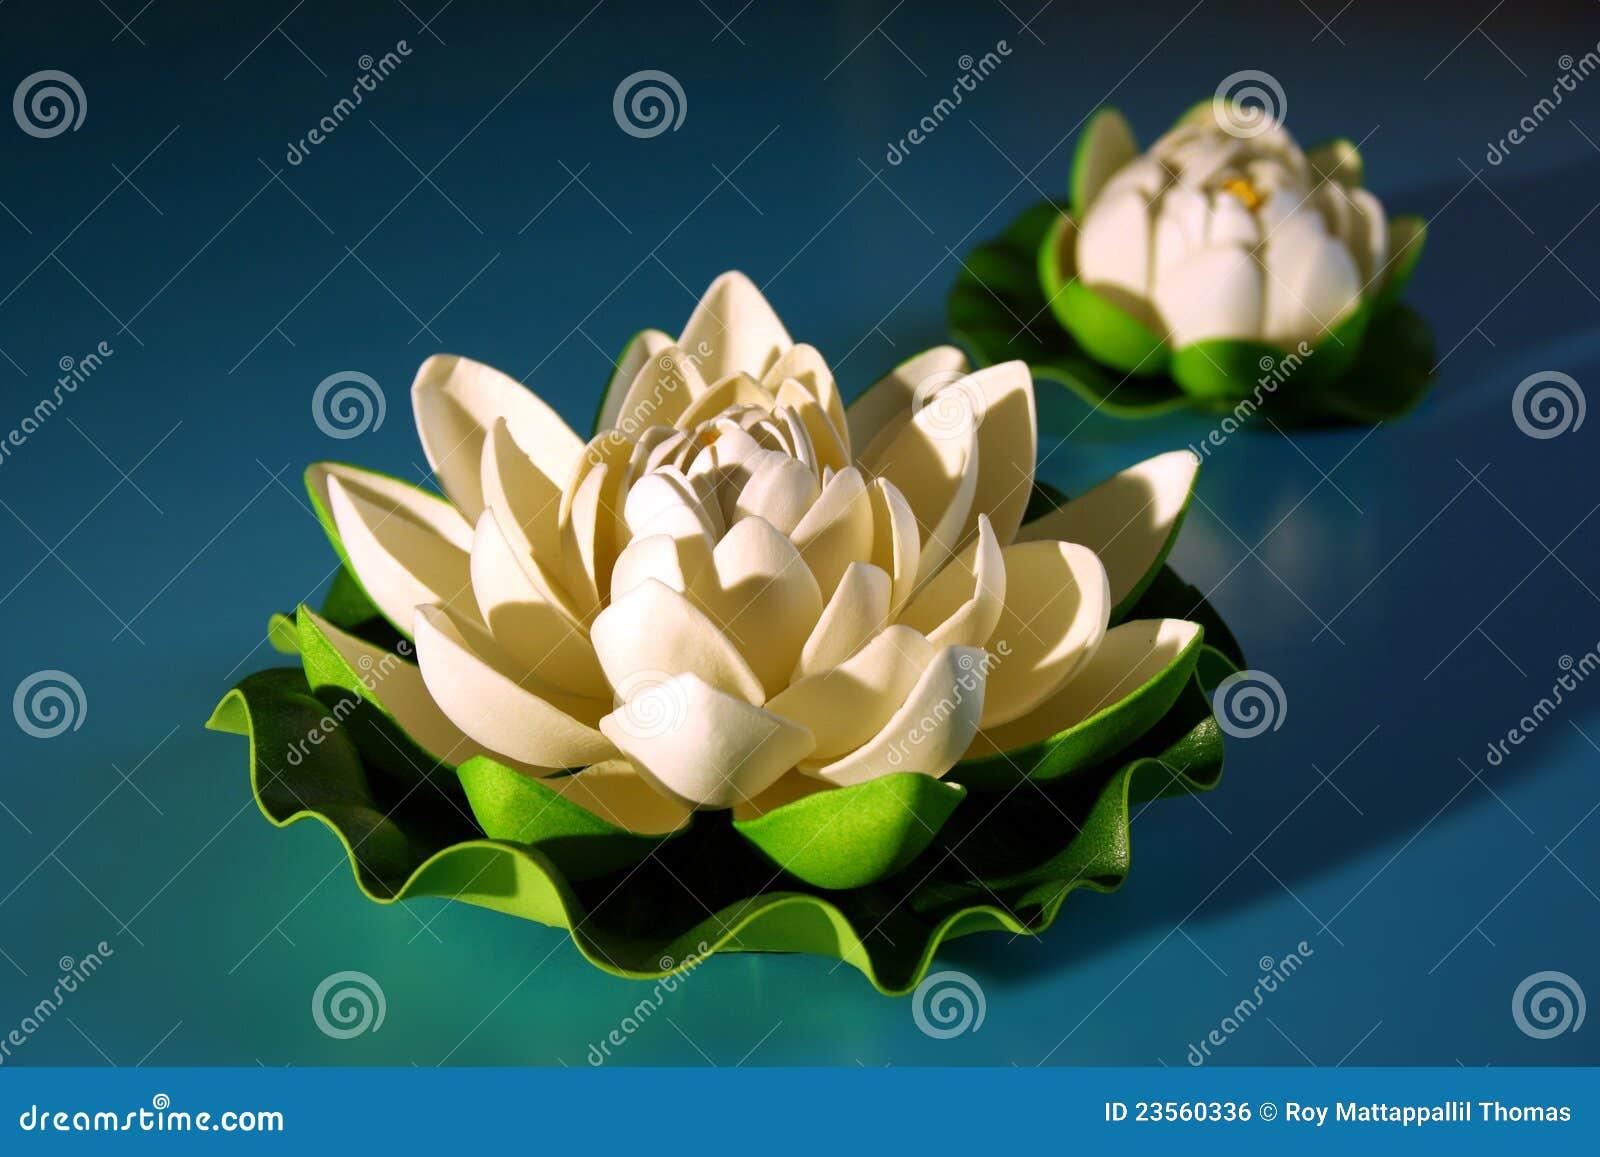 White lotus with bud